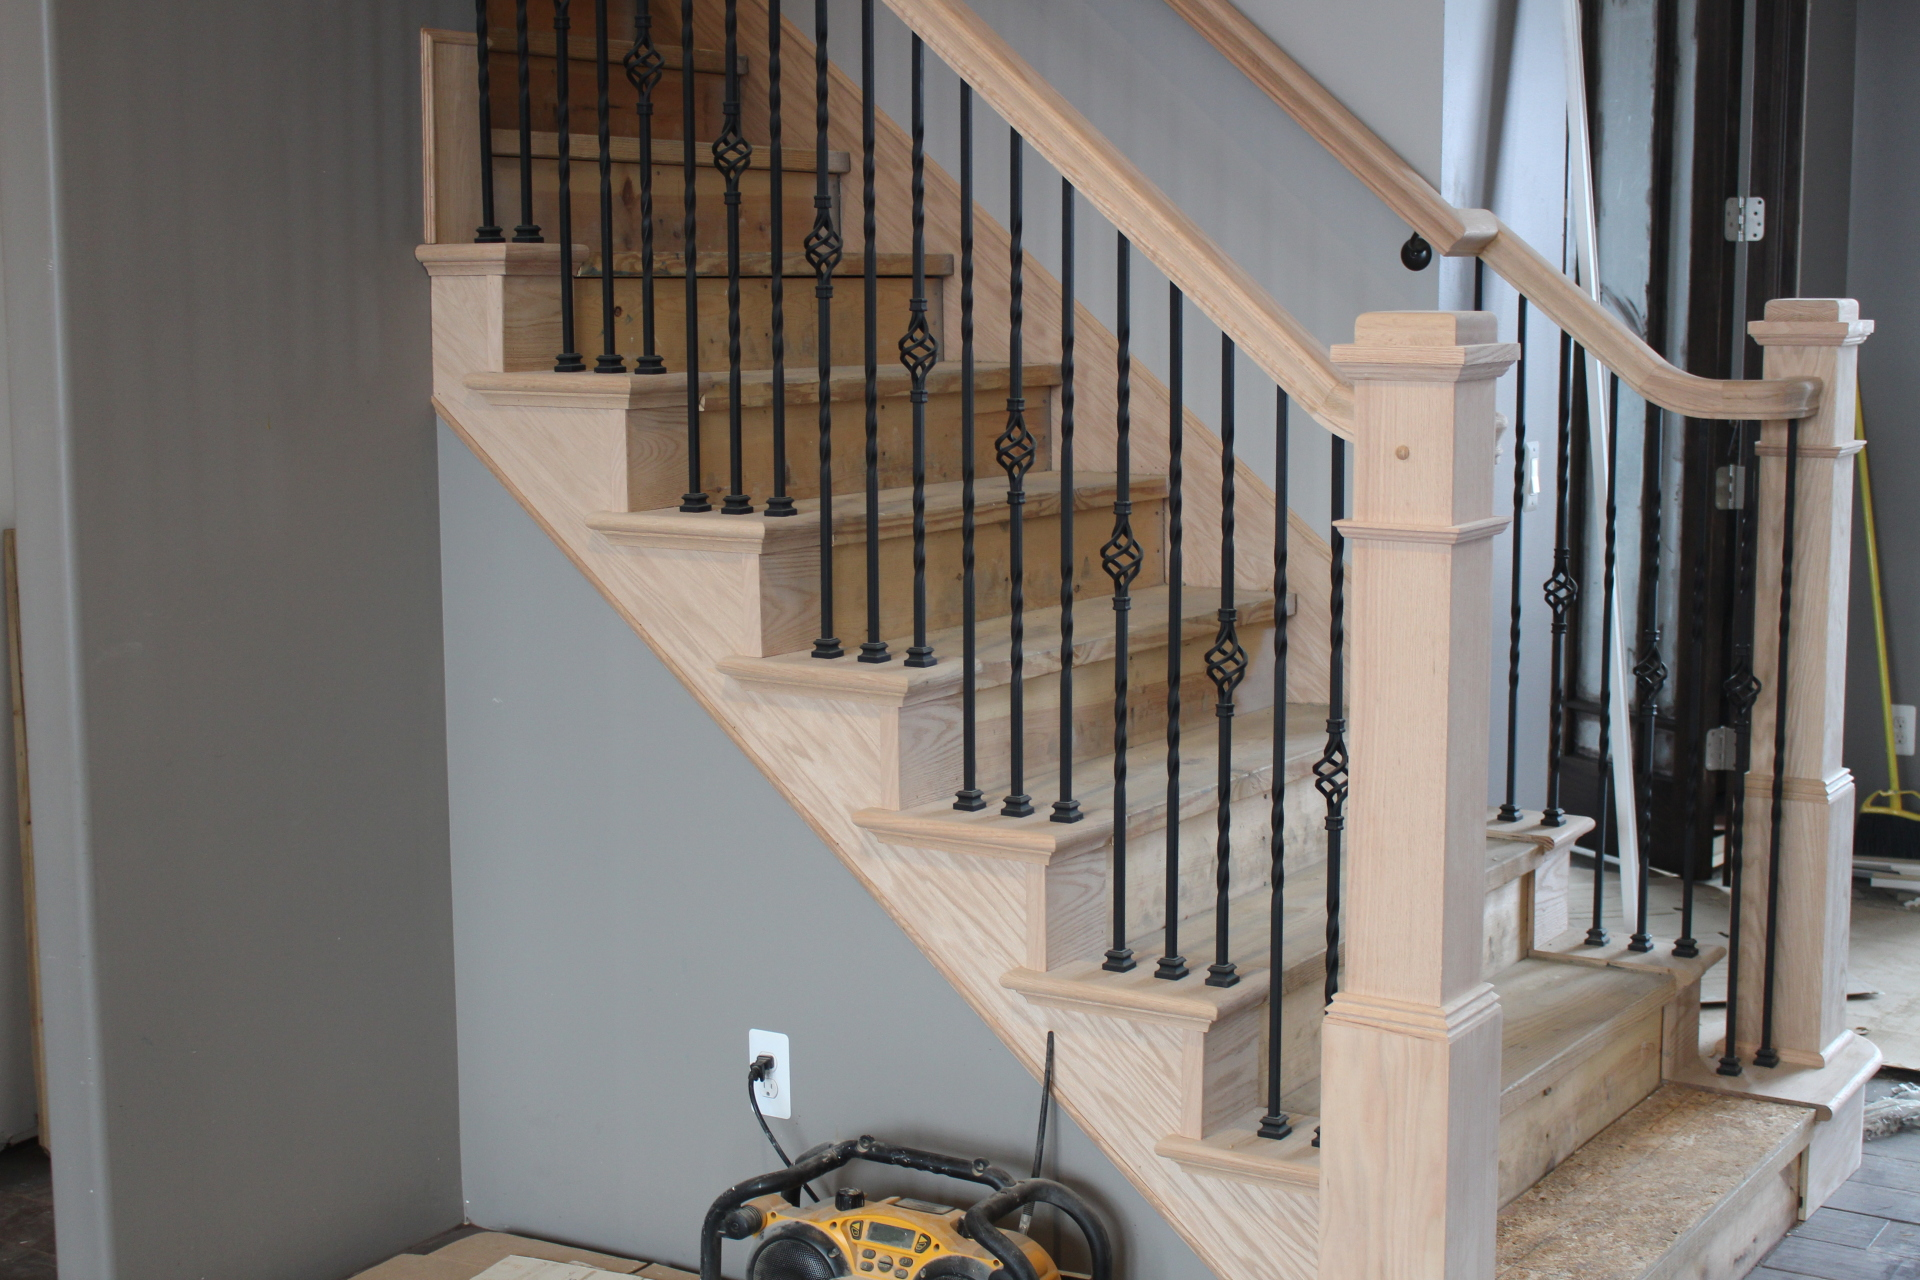 Custom handrails with false ends